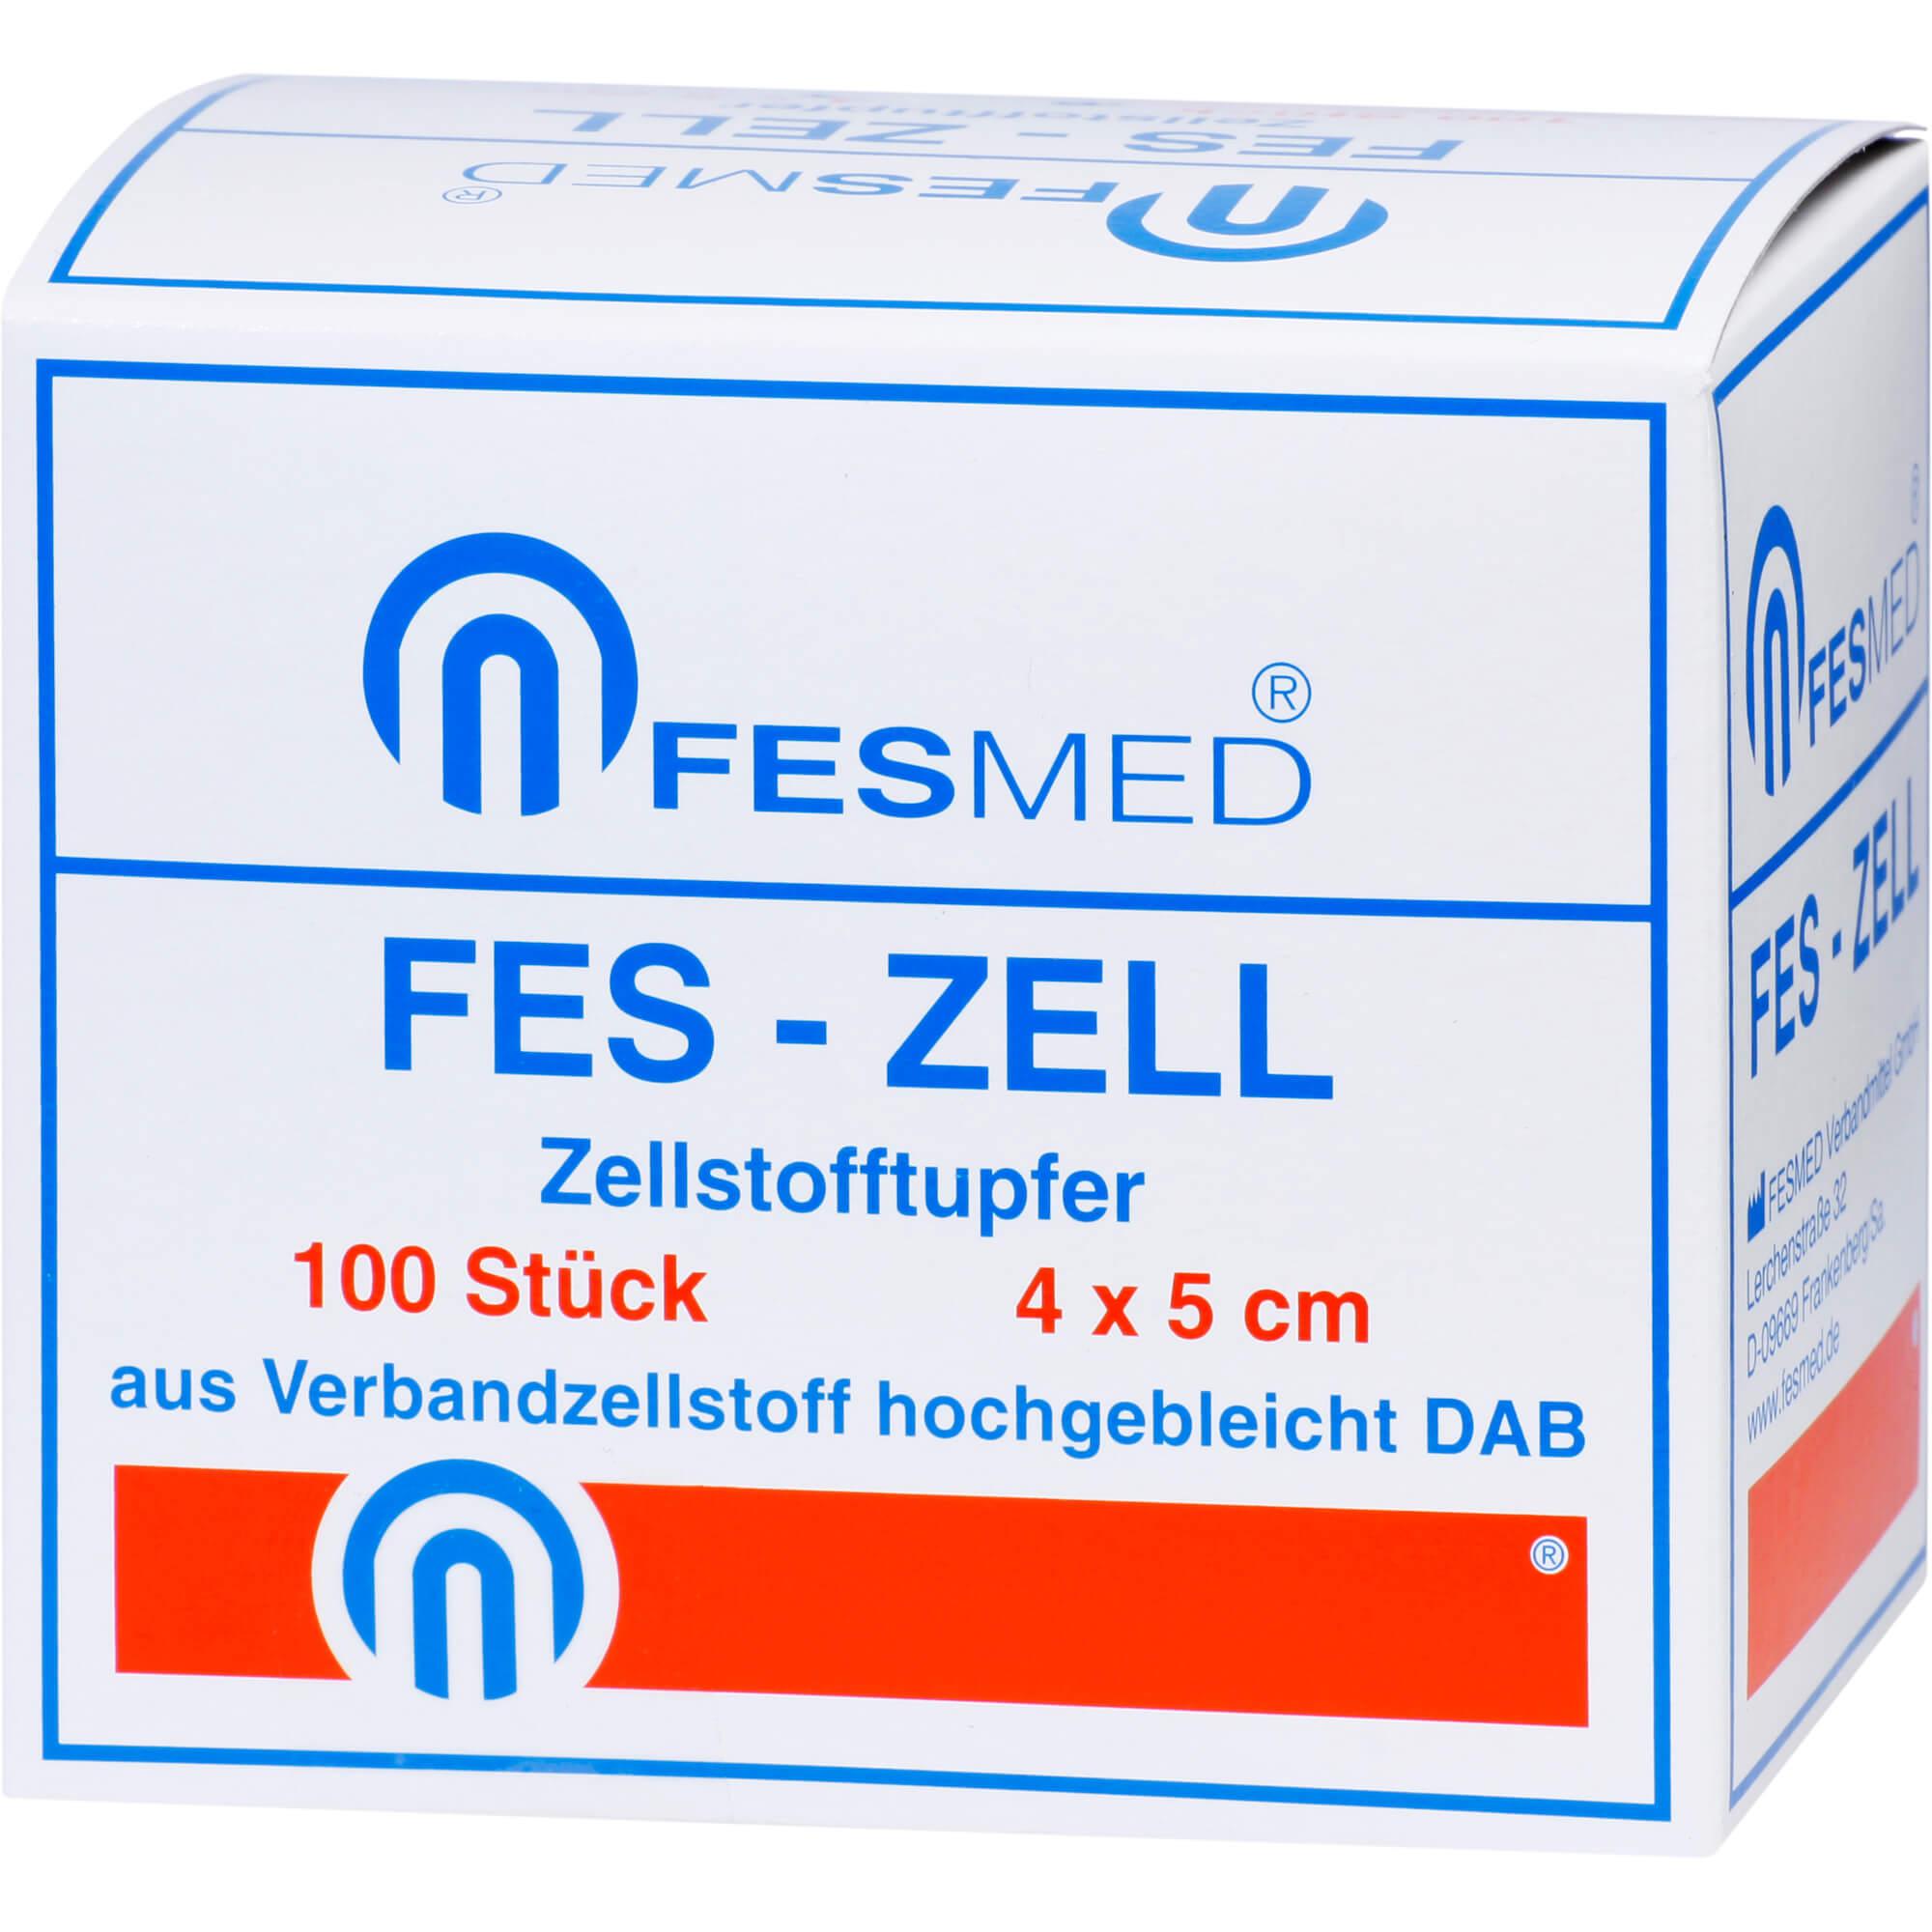 Fes-Zell Zellstofftupfer 4 x 5 cm